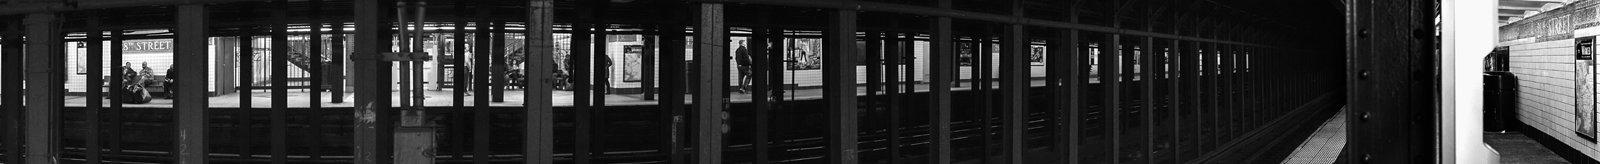 NYSubway.jpg